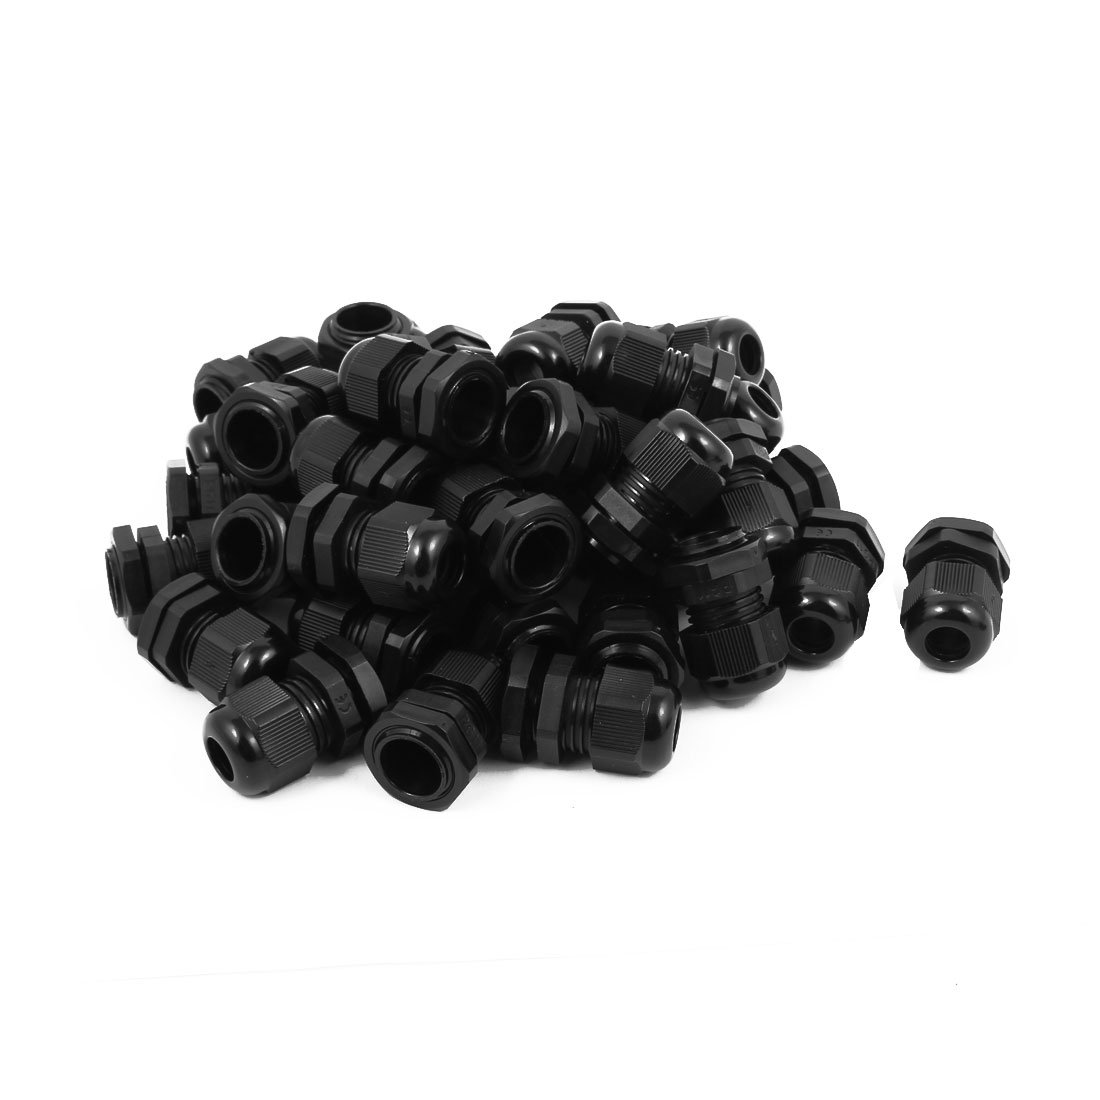 uxcell PG-11 Black Plastic Waterproof Connectors Cable Glands 20 Pcs